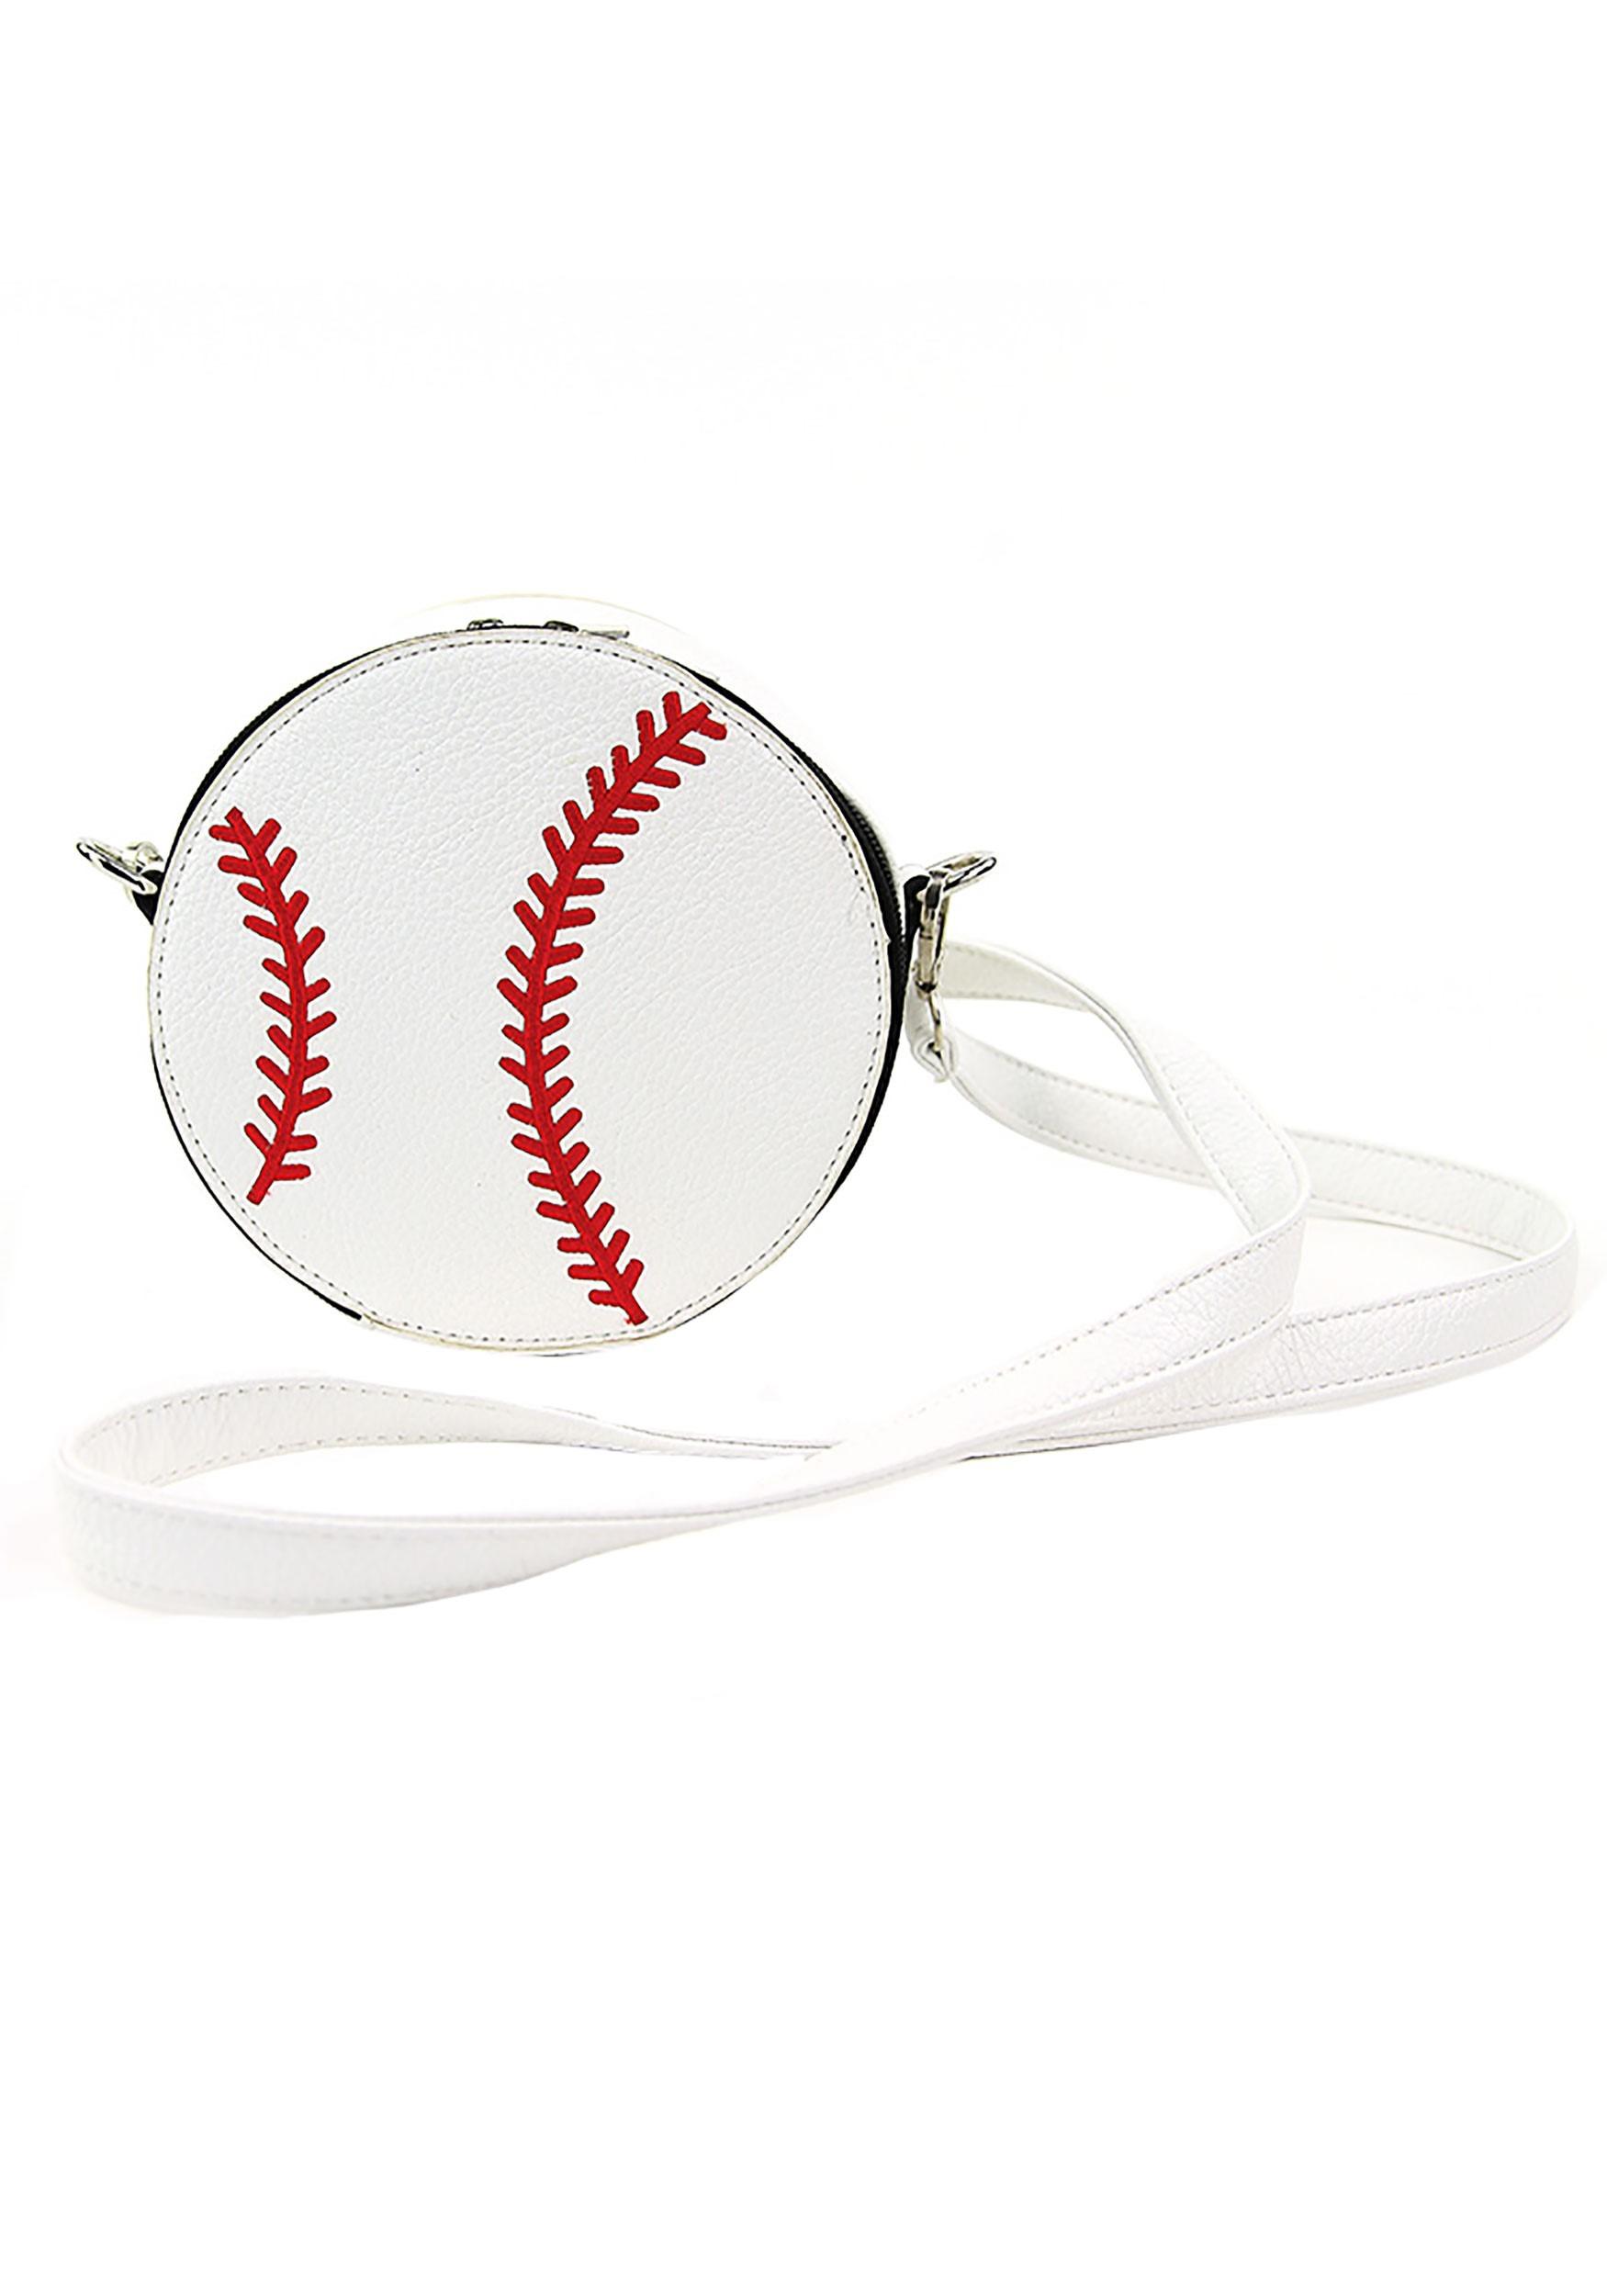 Baseball - Purse (CEC89567UB-ST CEC89567UB) photo